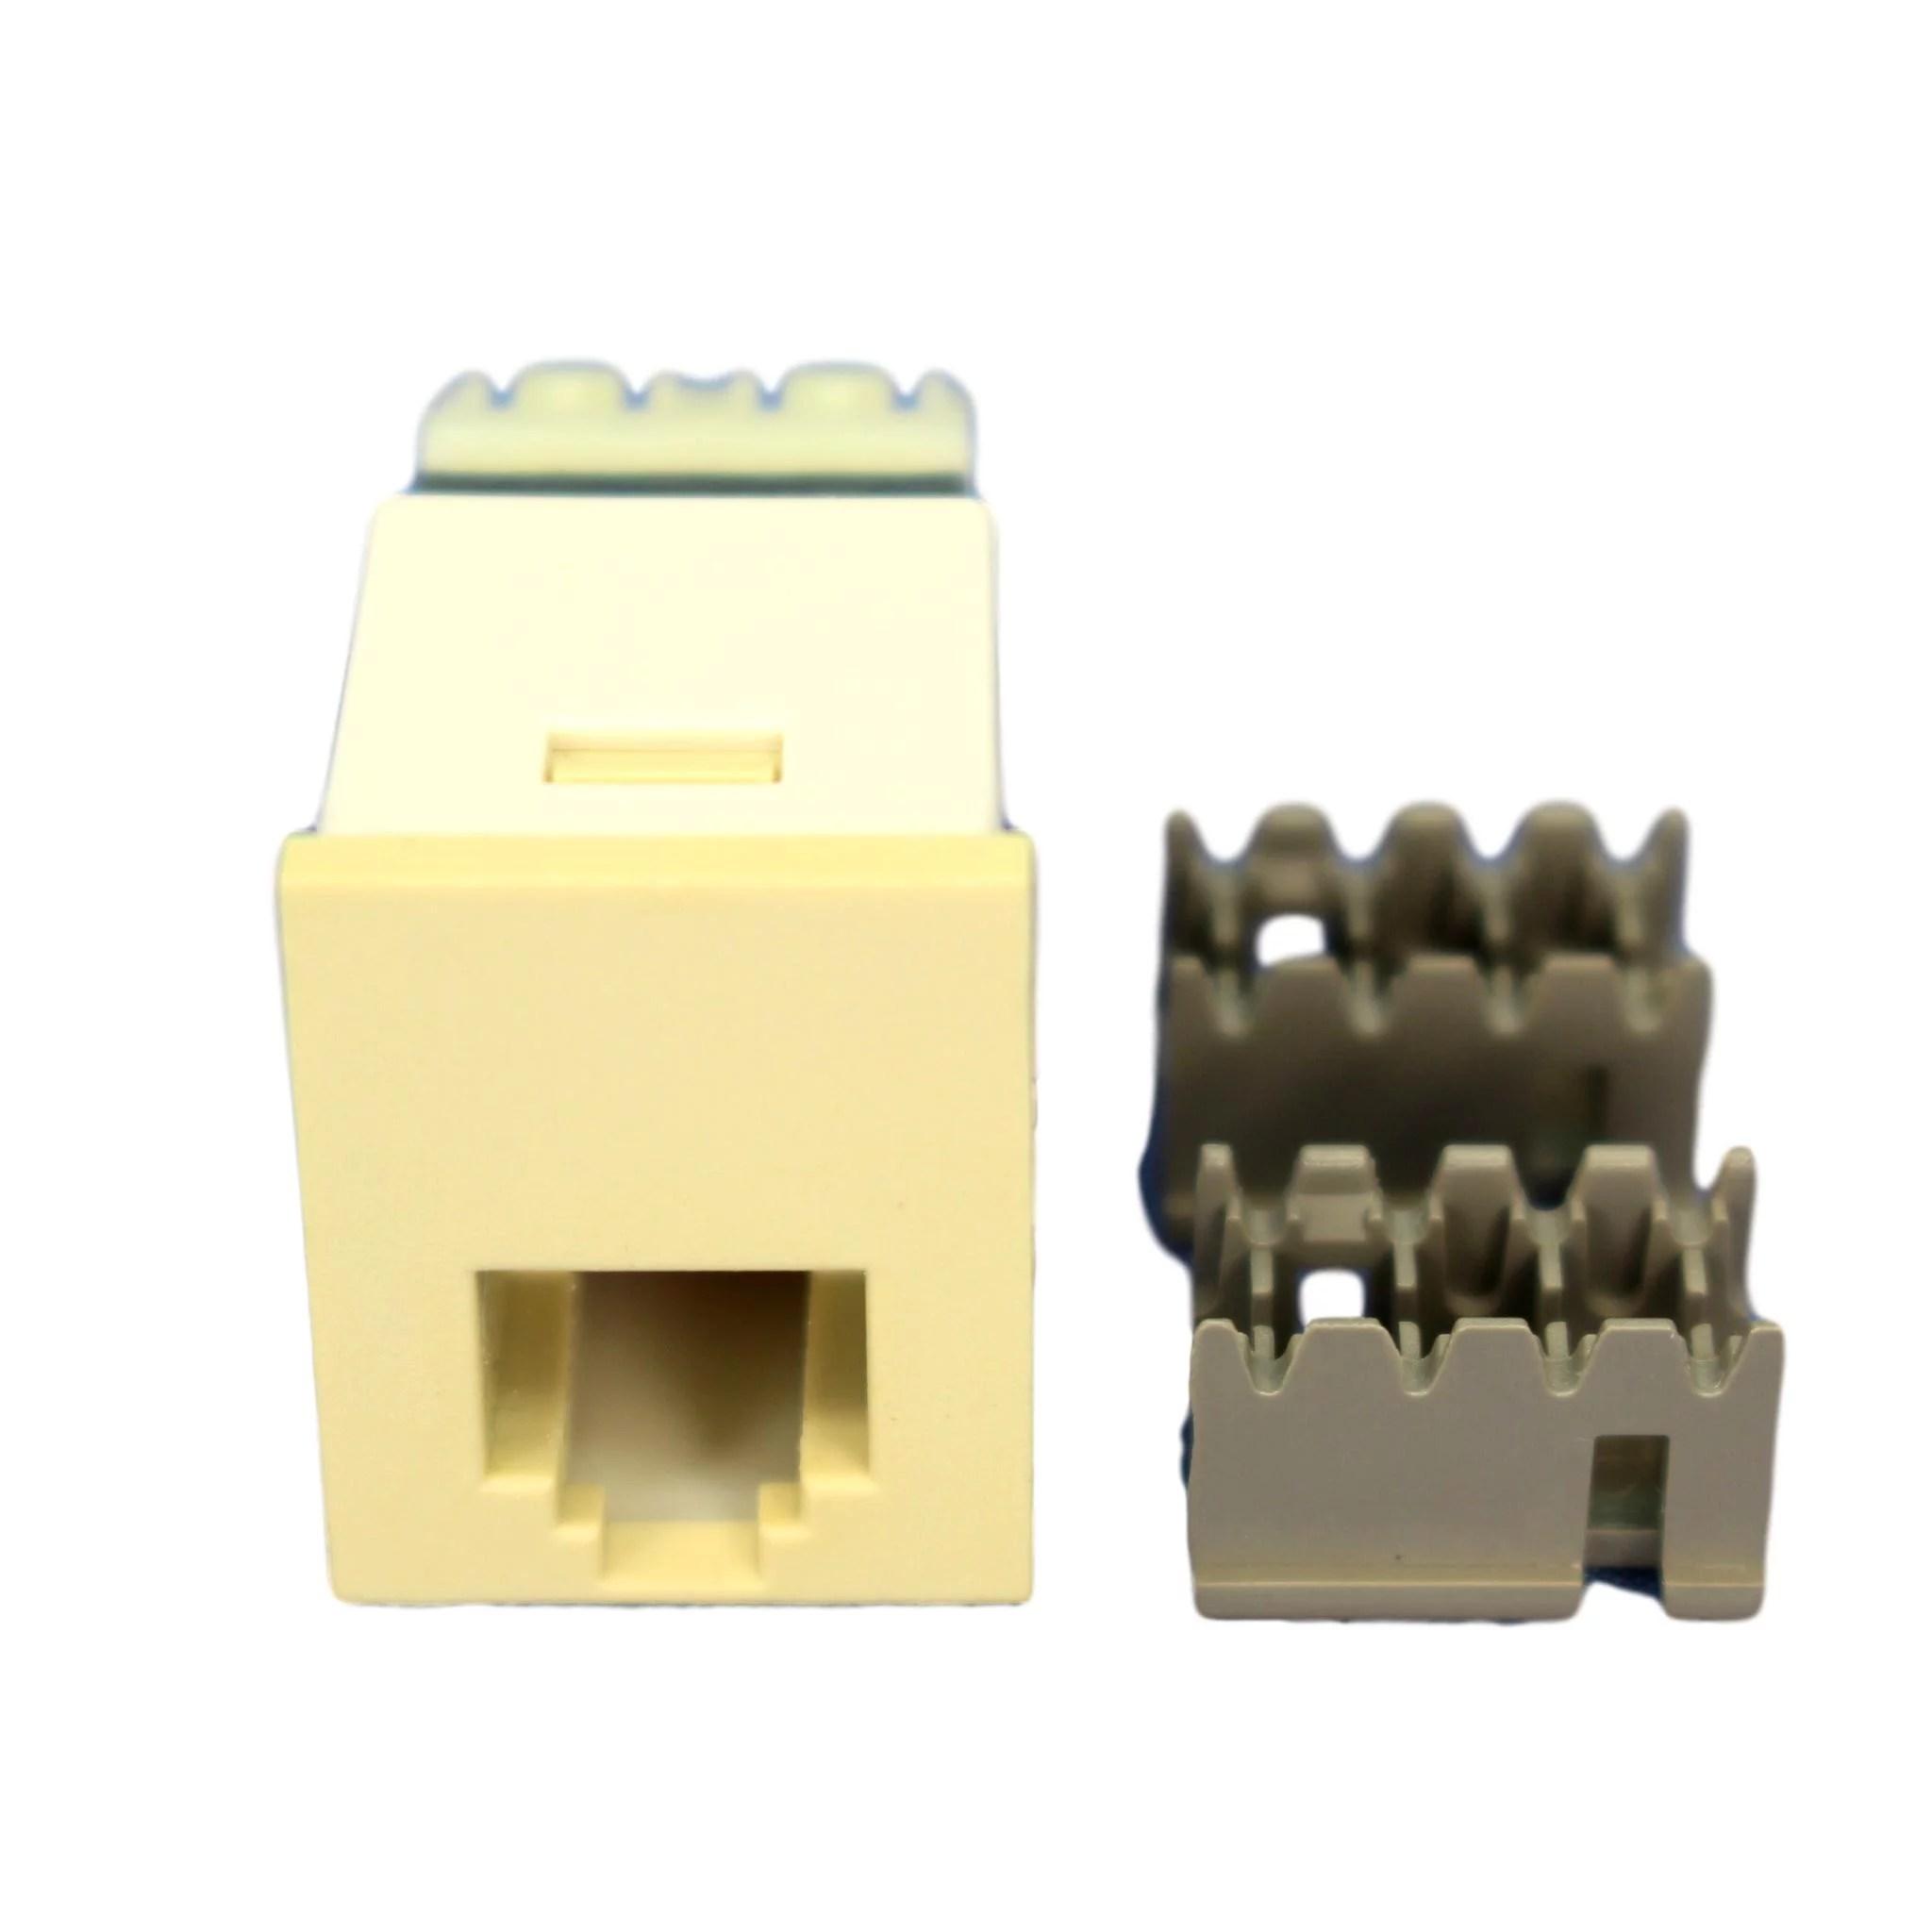 medium resolution of p s ivory smooth 6 wire phone jack rj25c telephone usoc wiring 6p 6c cat3 category 3 s6u i 6 wire phone jack wiring